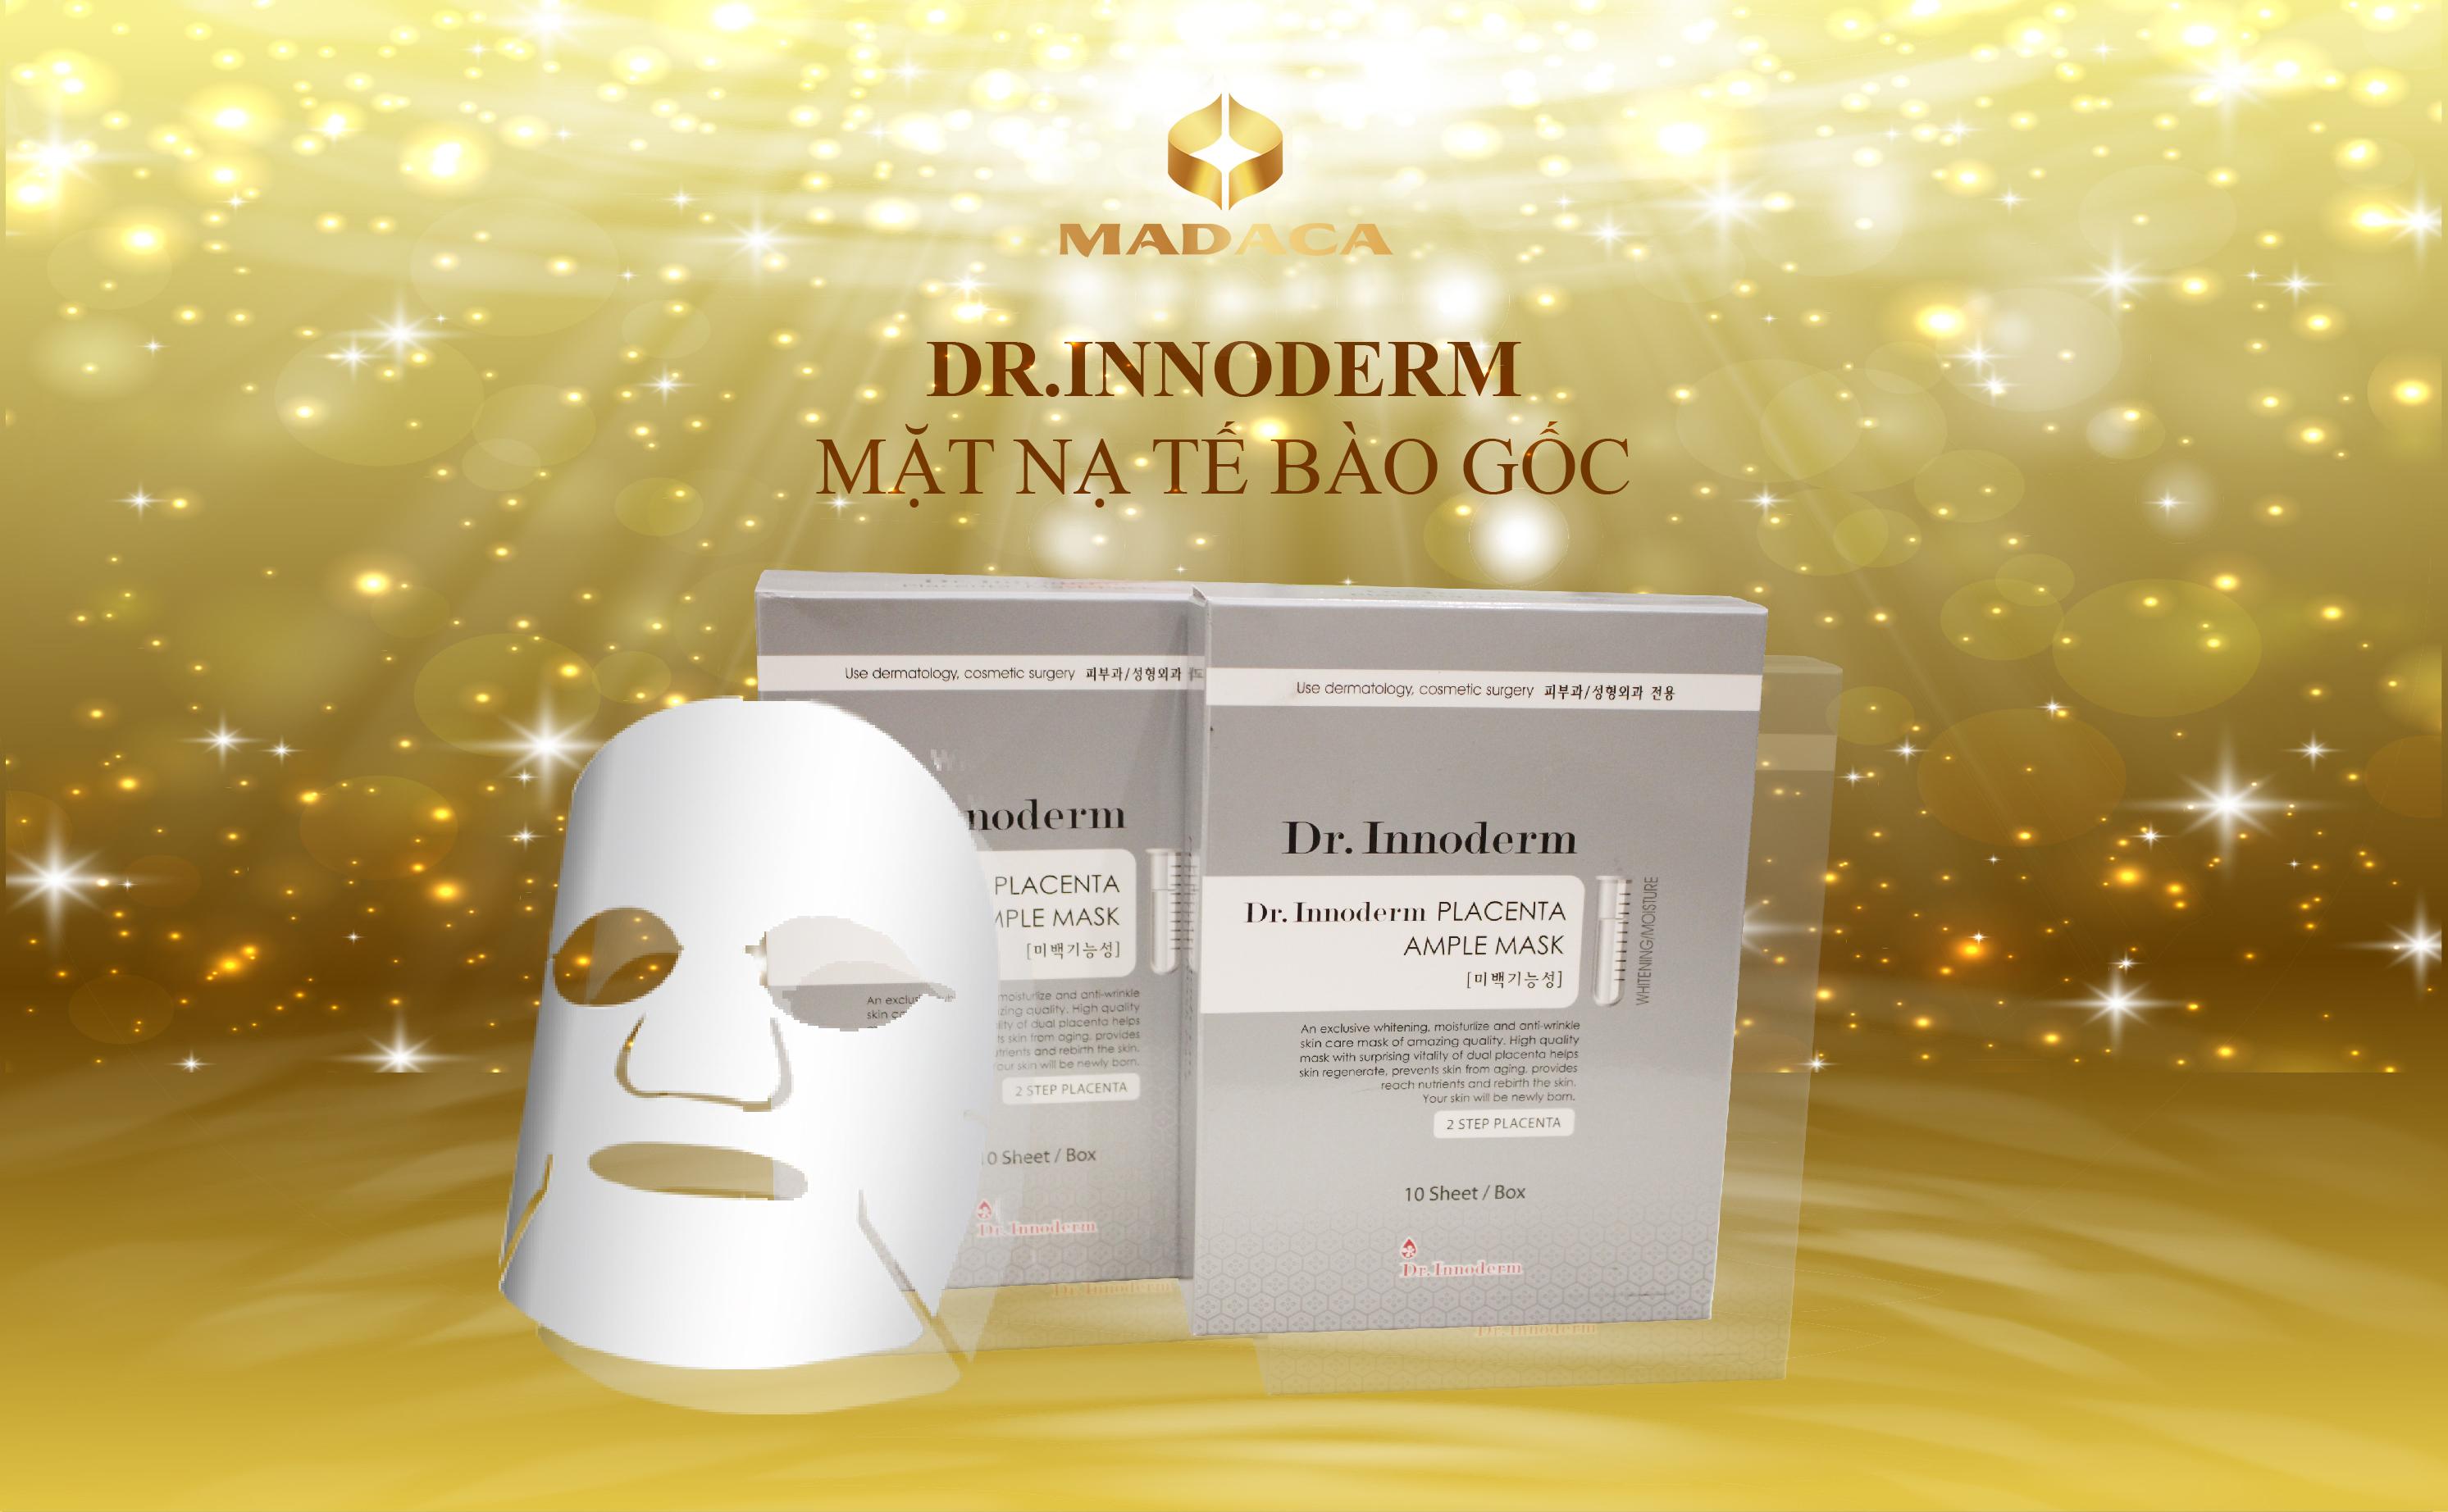 Mặt nạ Dr. Innoderm